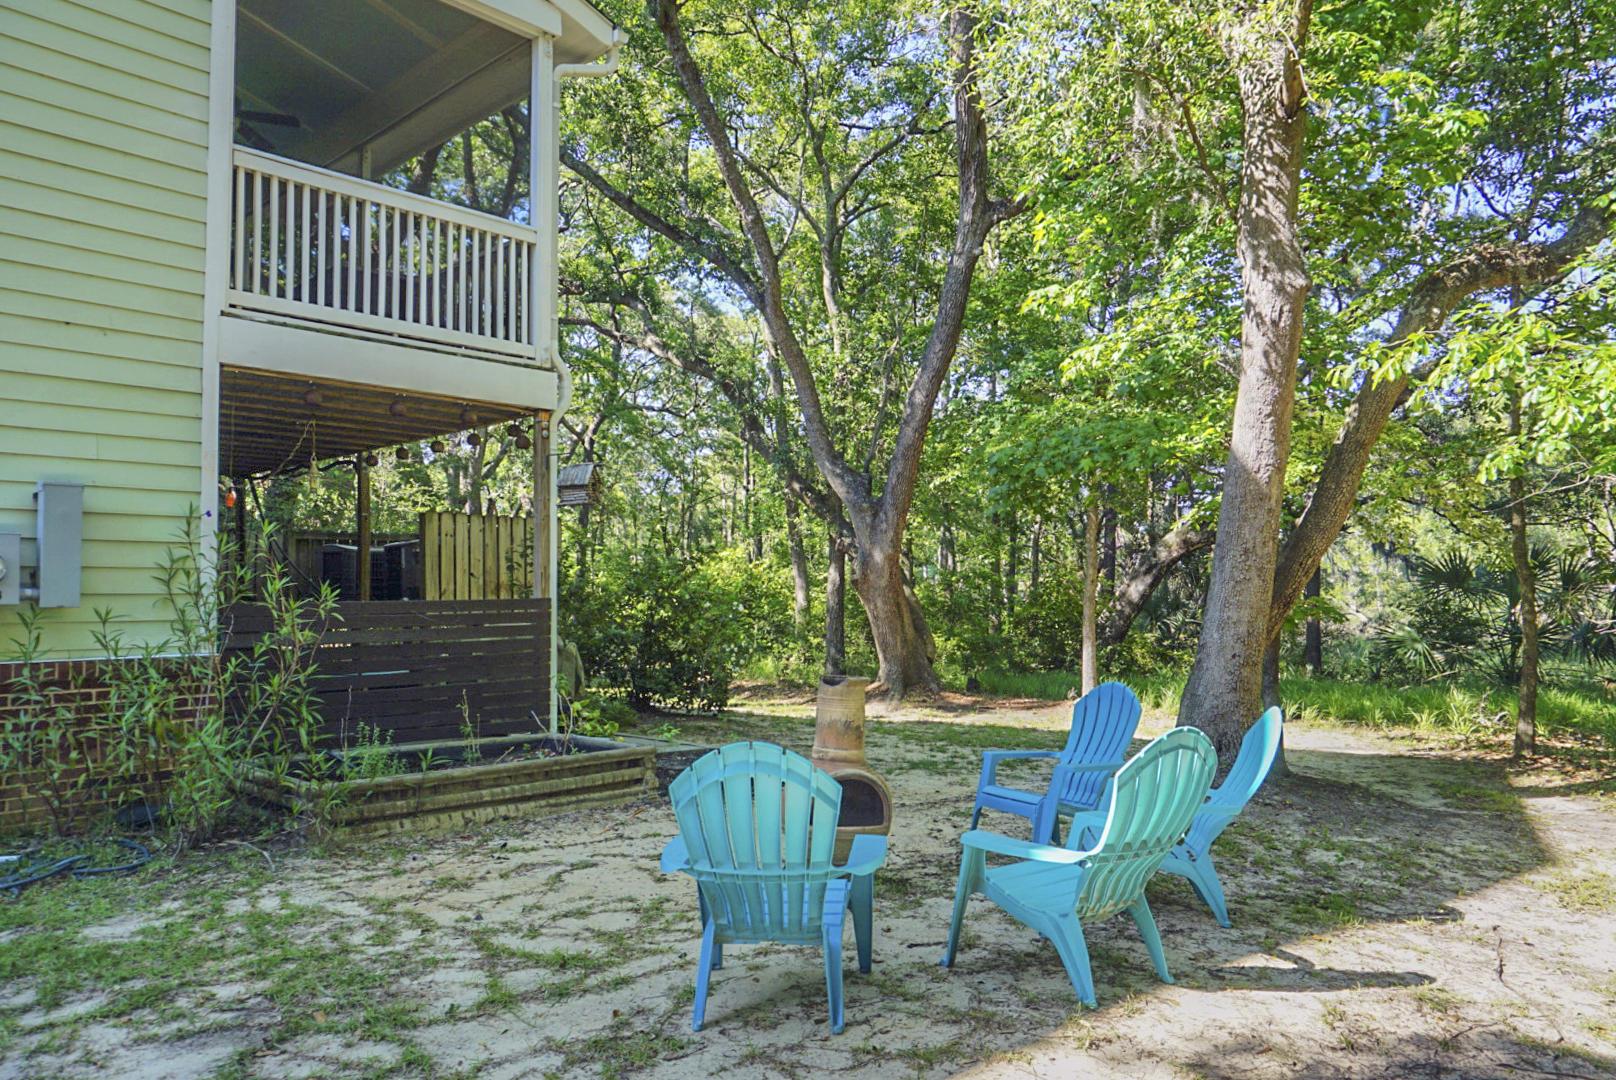 Etiwan Pointe Homes For Sale - 269 Etiwan Pointe, Mount Pleasant, SC - 20